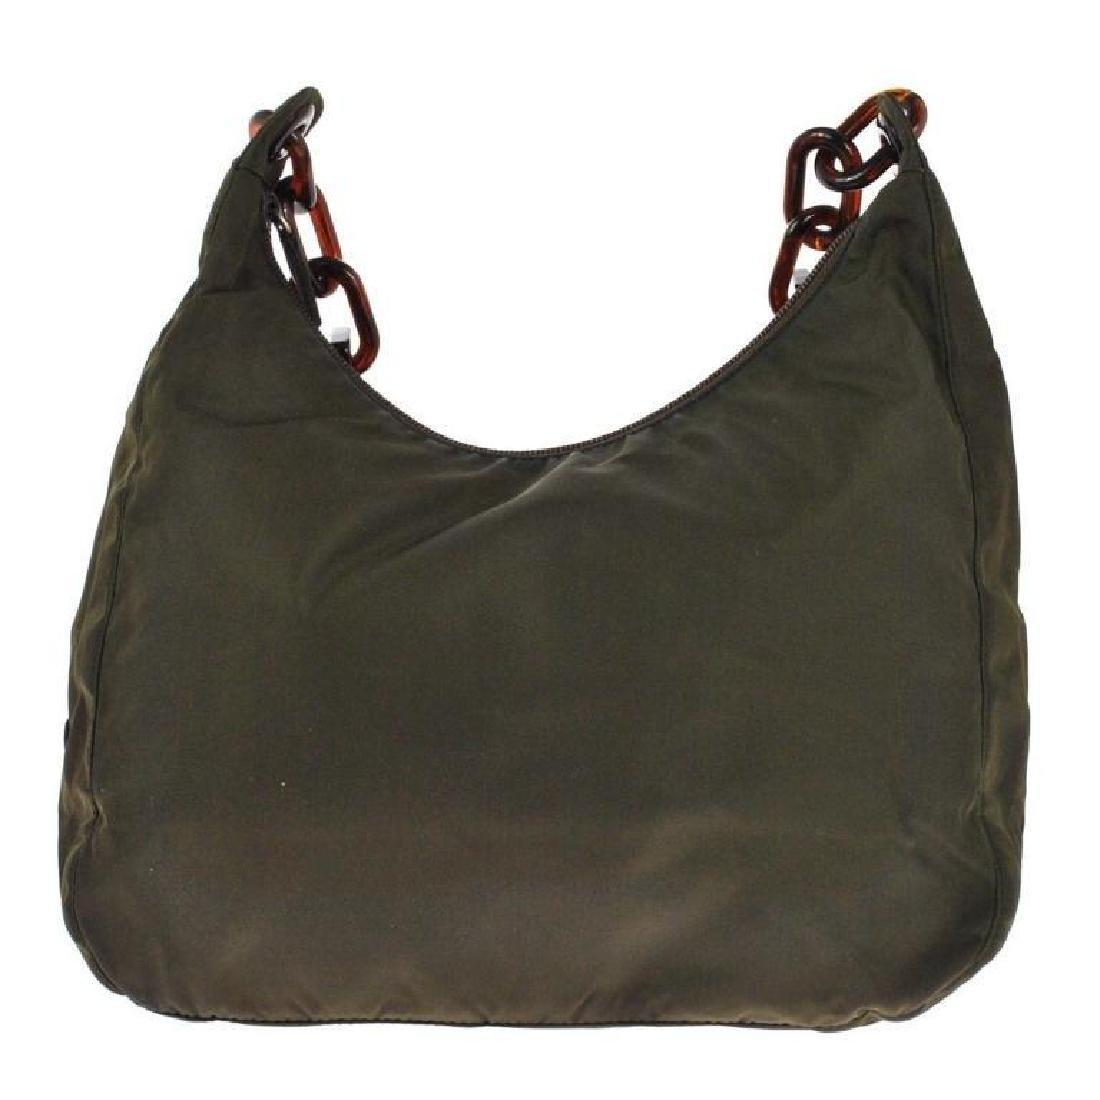 Authentic PRADA Nylon Olive Brown Purse Bag